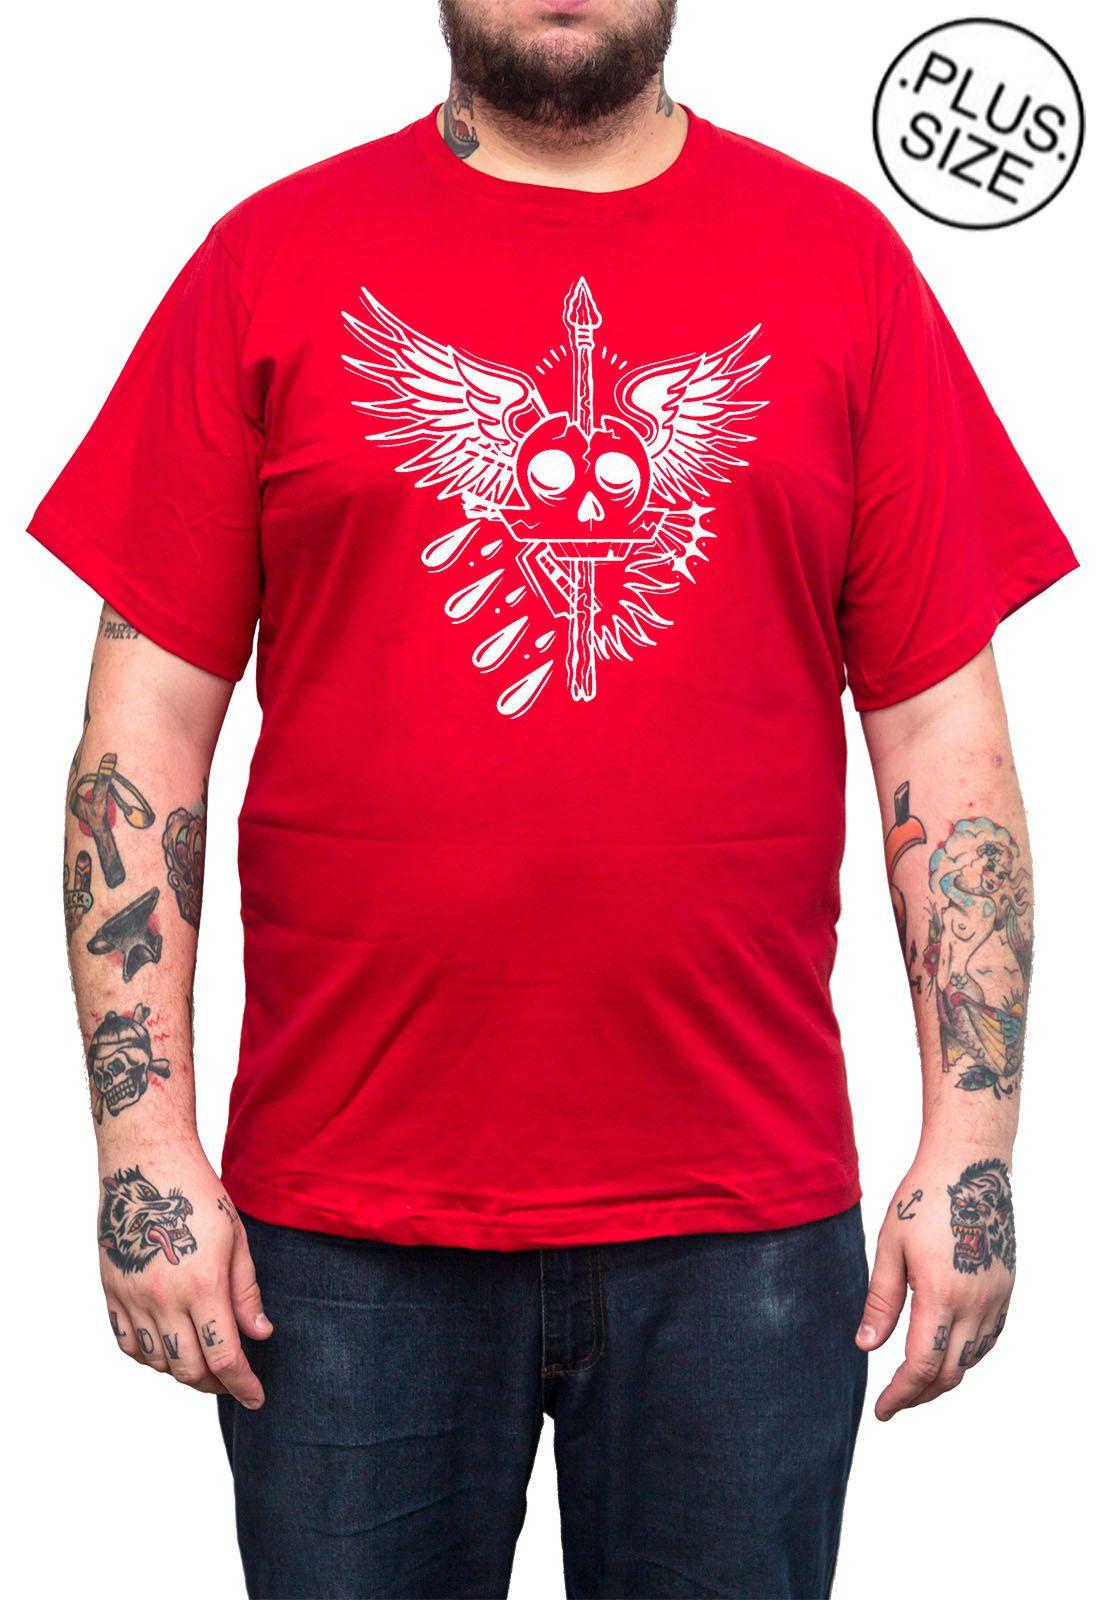 Camiseta Hshop Skull - Vermelho - Plus Size - Tamanho Grande XG  - HShop